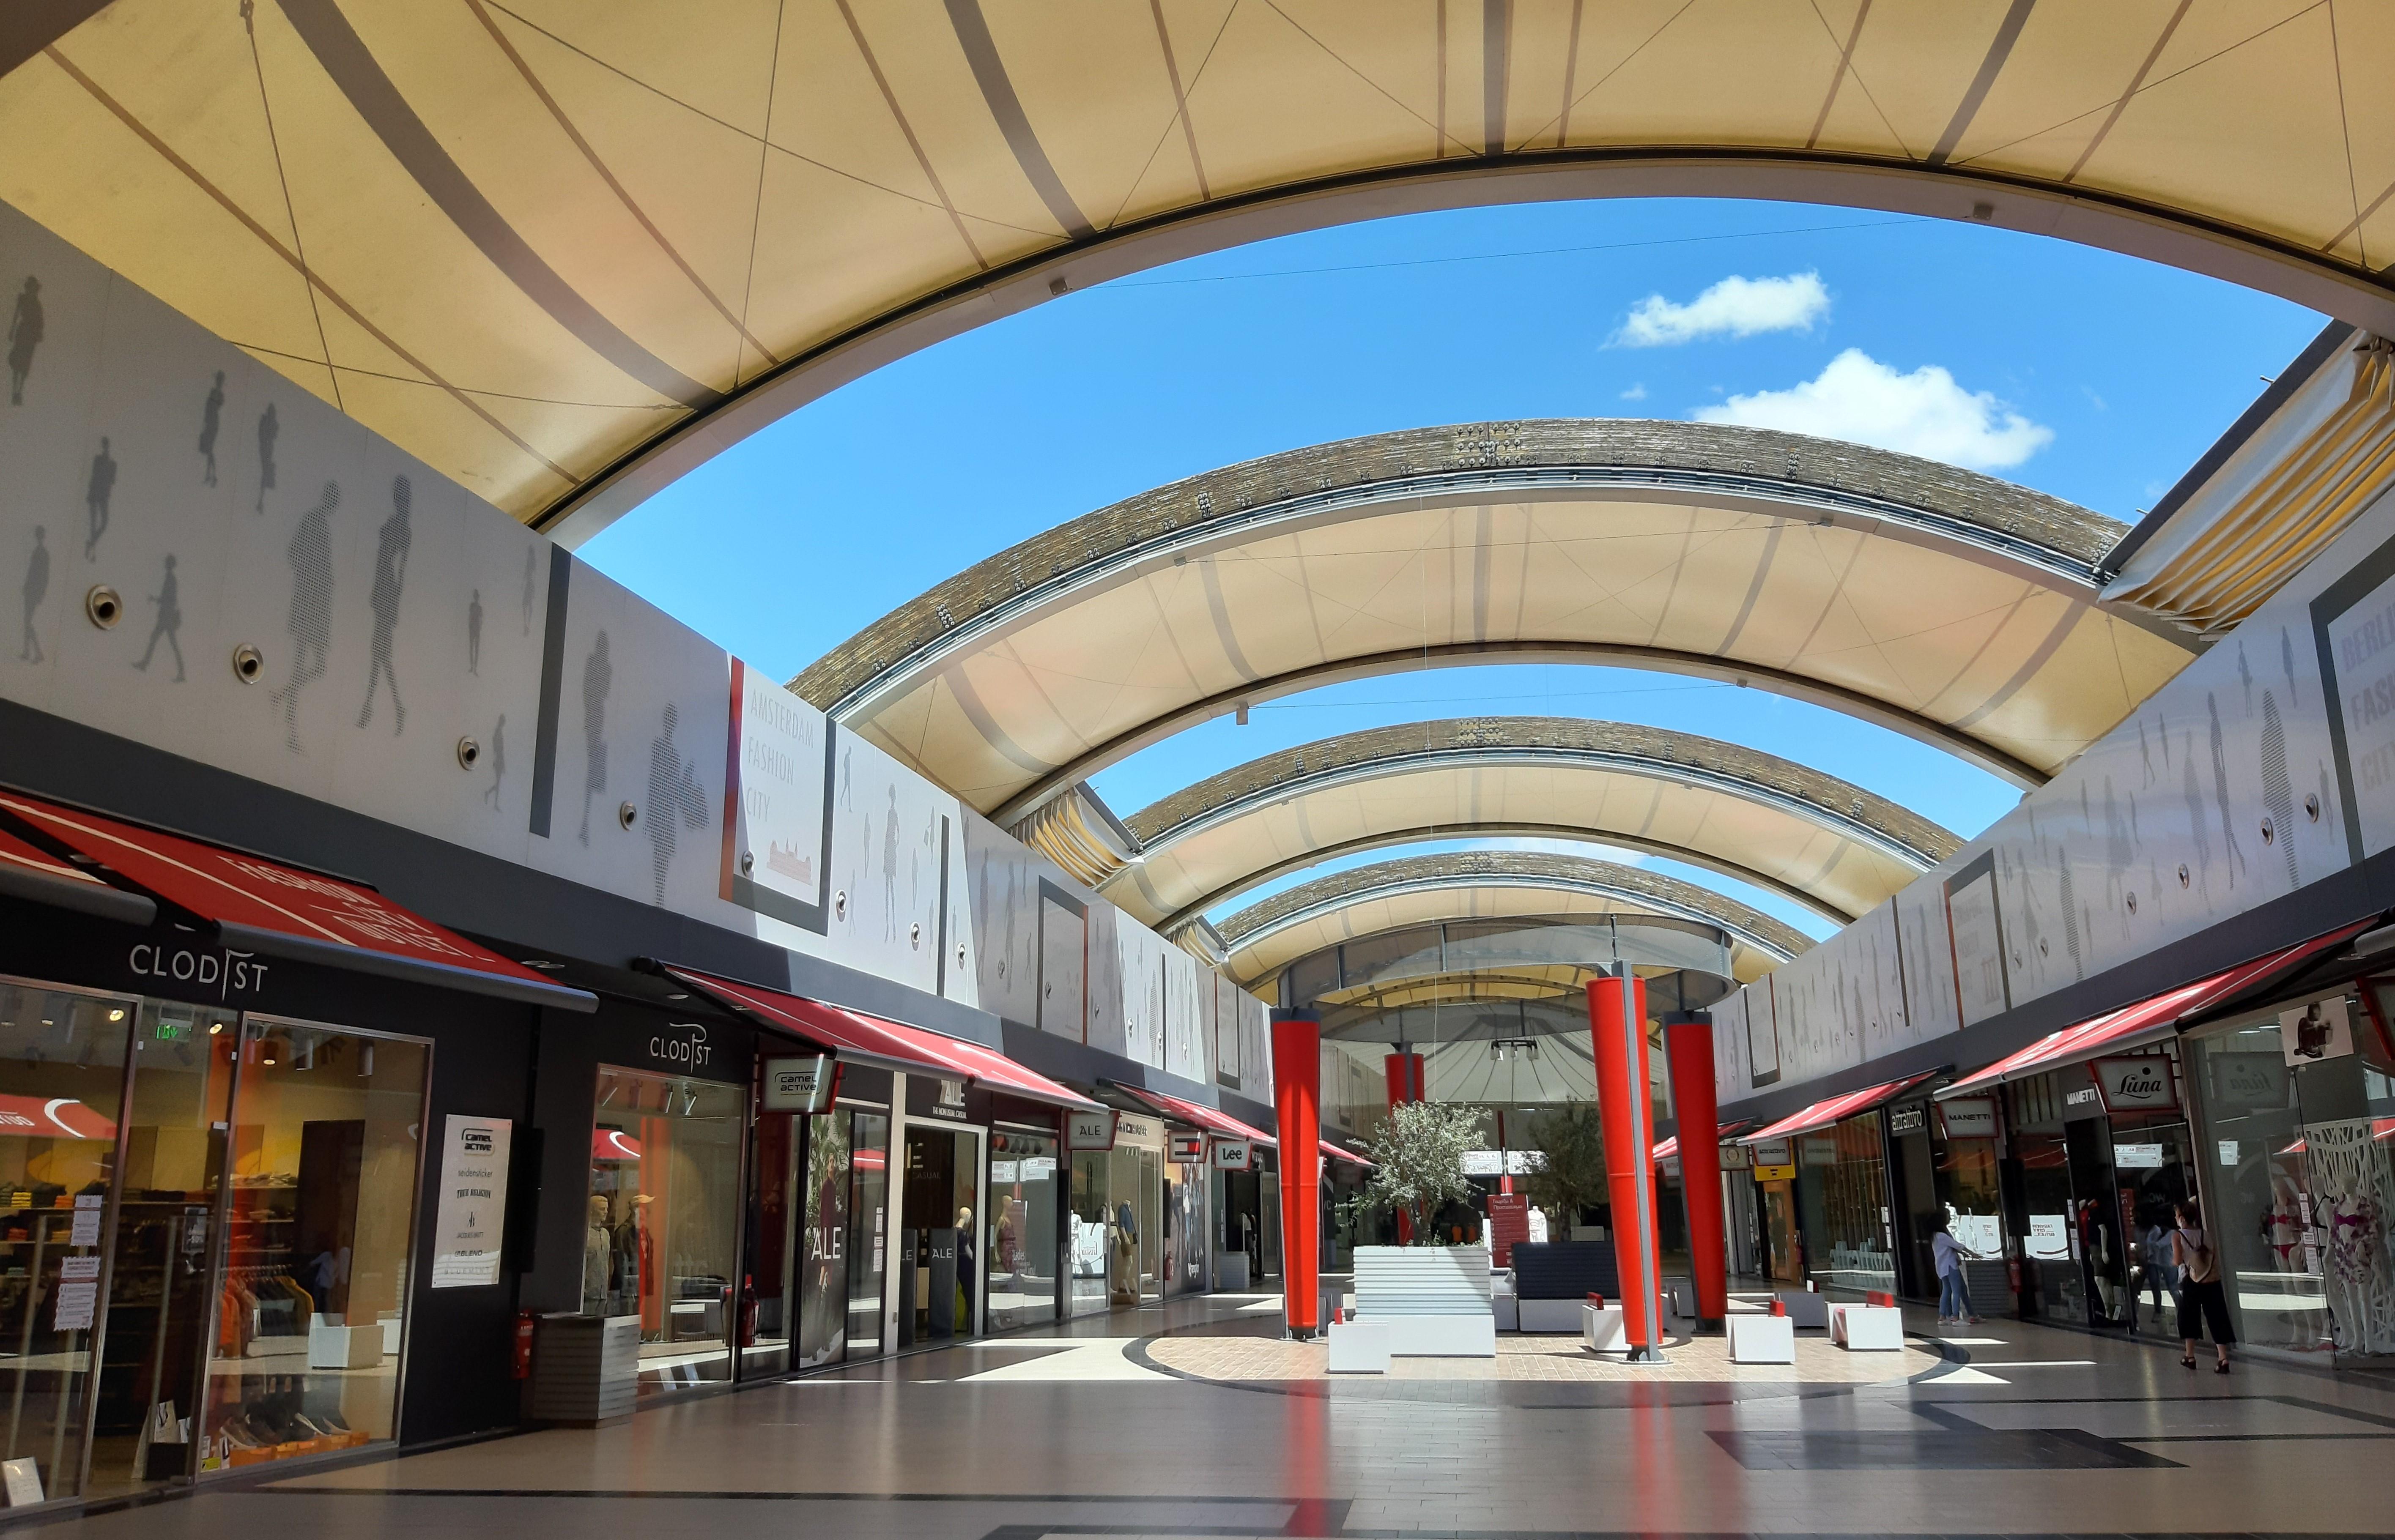 Fashion City Outlet : Μέτρα πρόληψης και προστασίας κατά του Covid-19